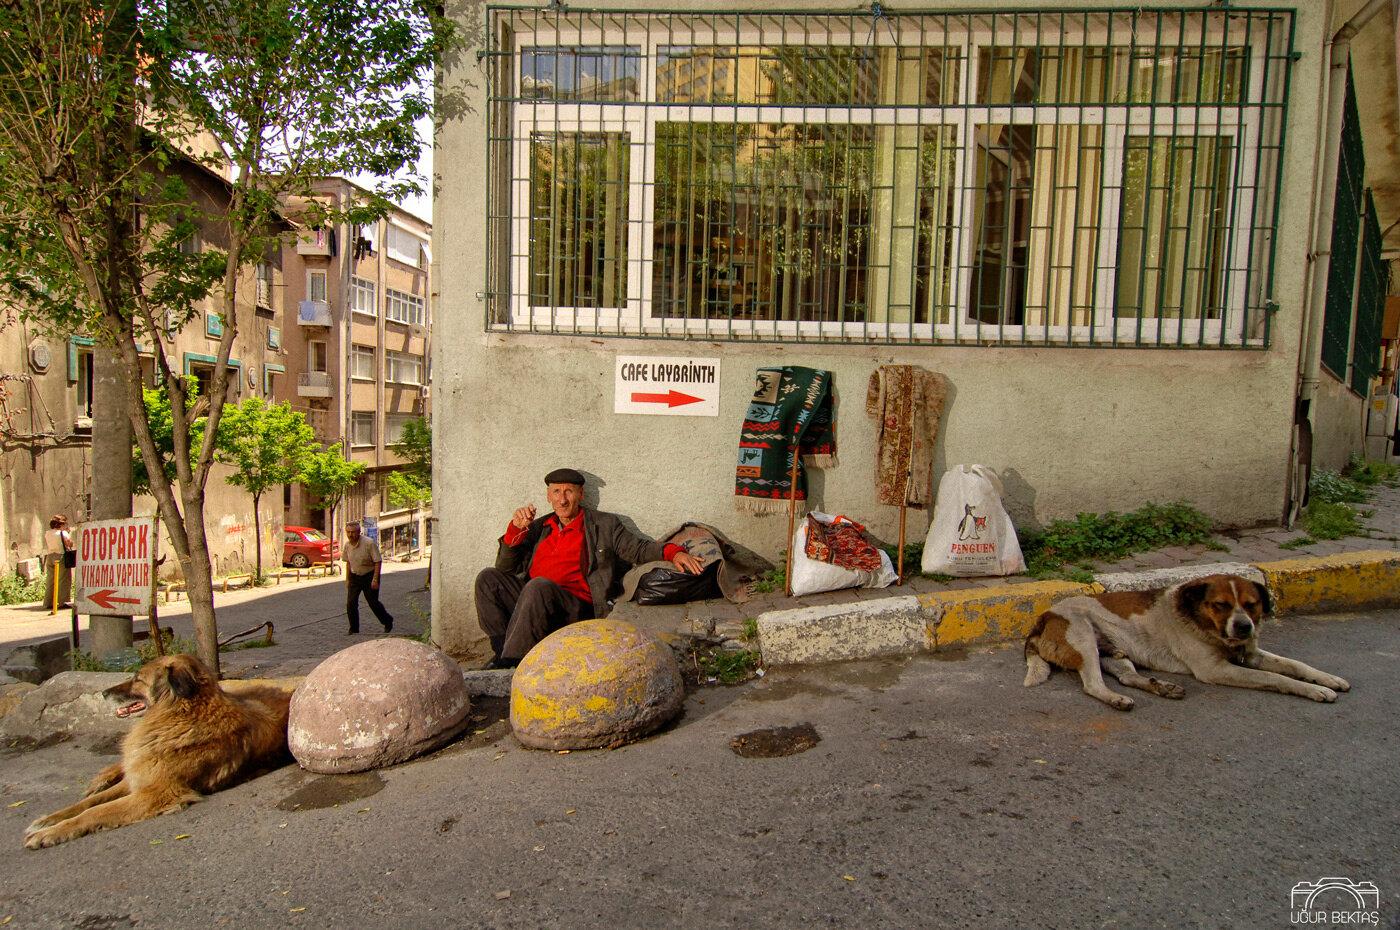 Kopekli_Hali_Saticisi_Cihangir_istanbul.jpg